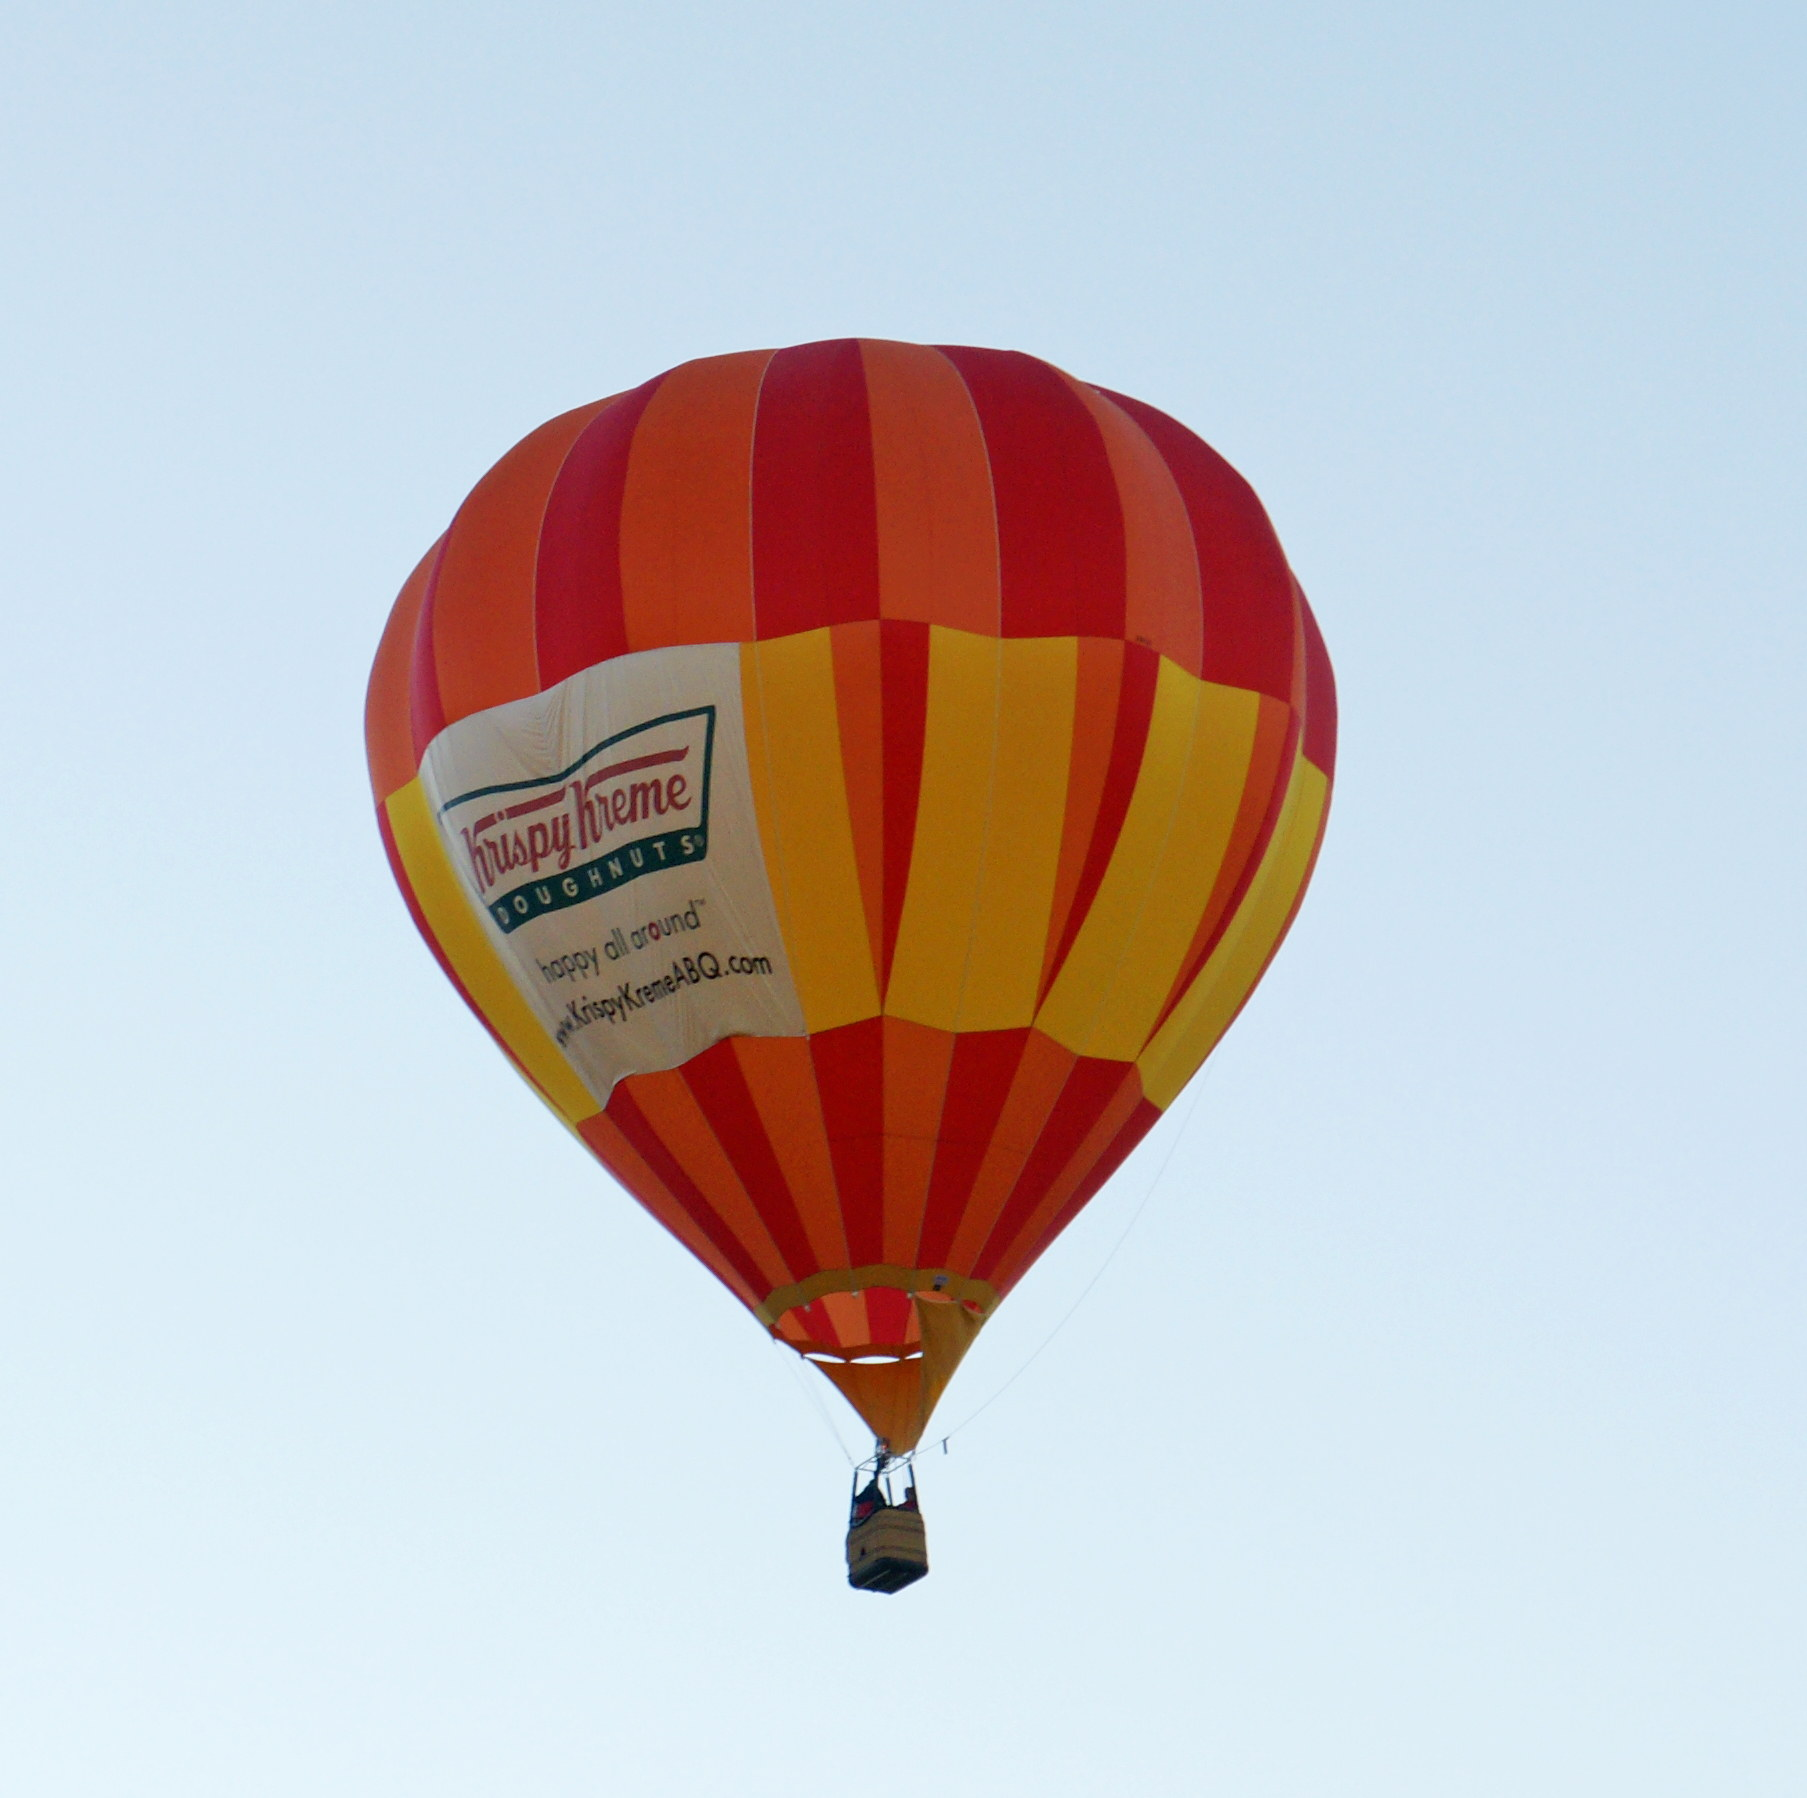 aibf-Single-Balloons-Gallery01